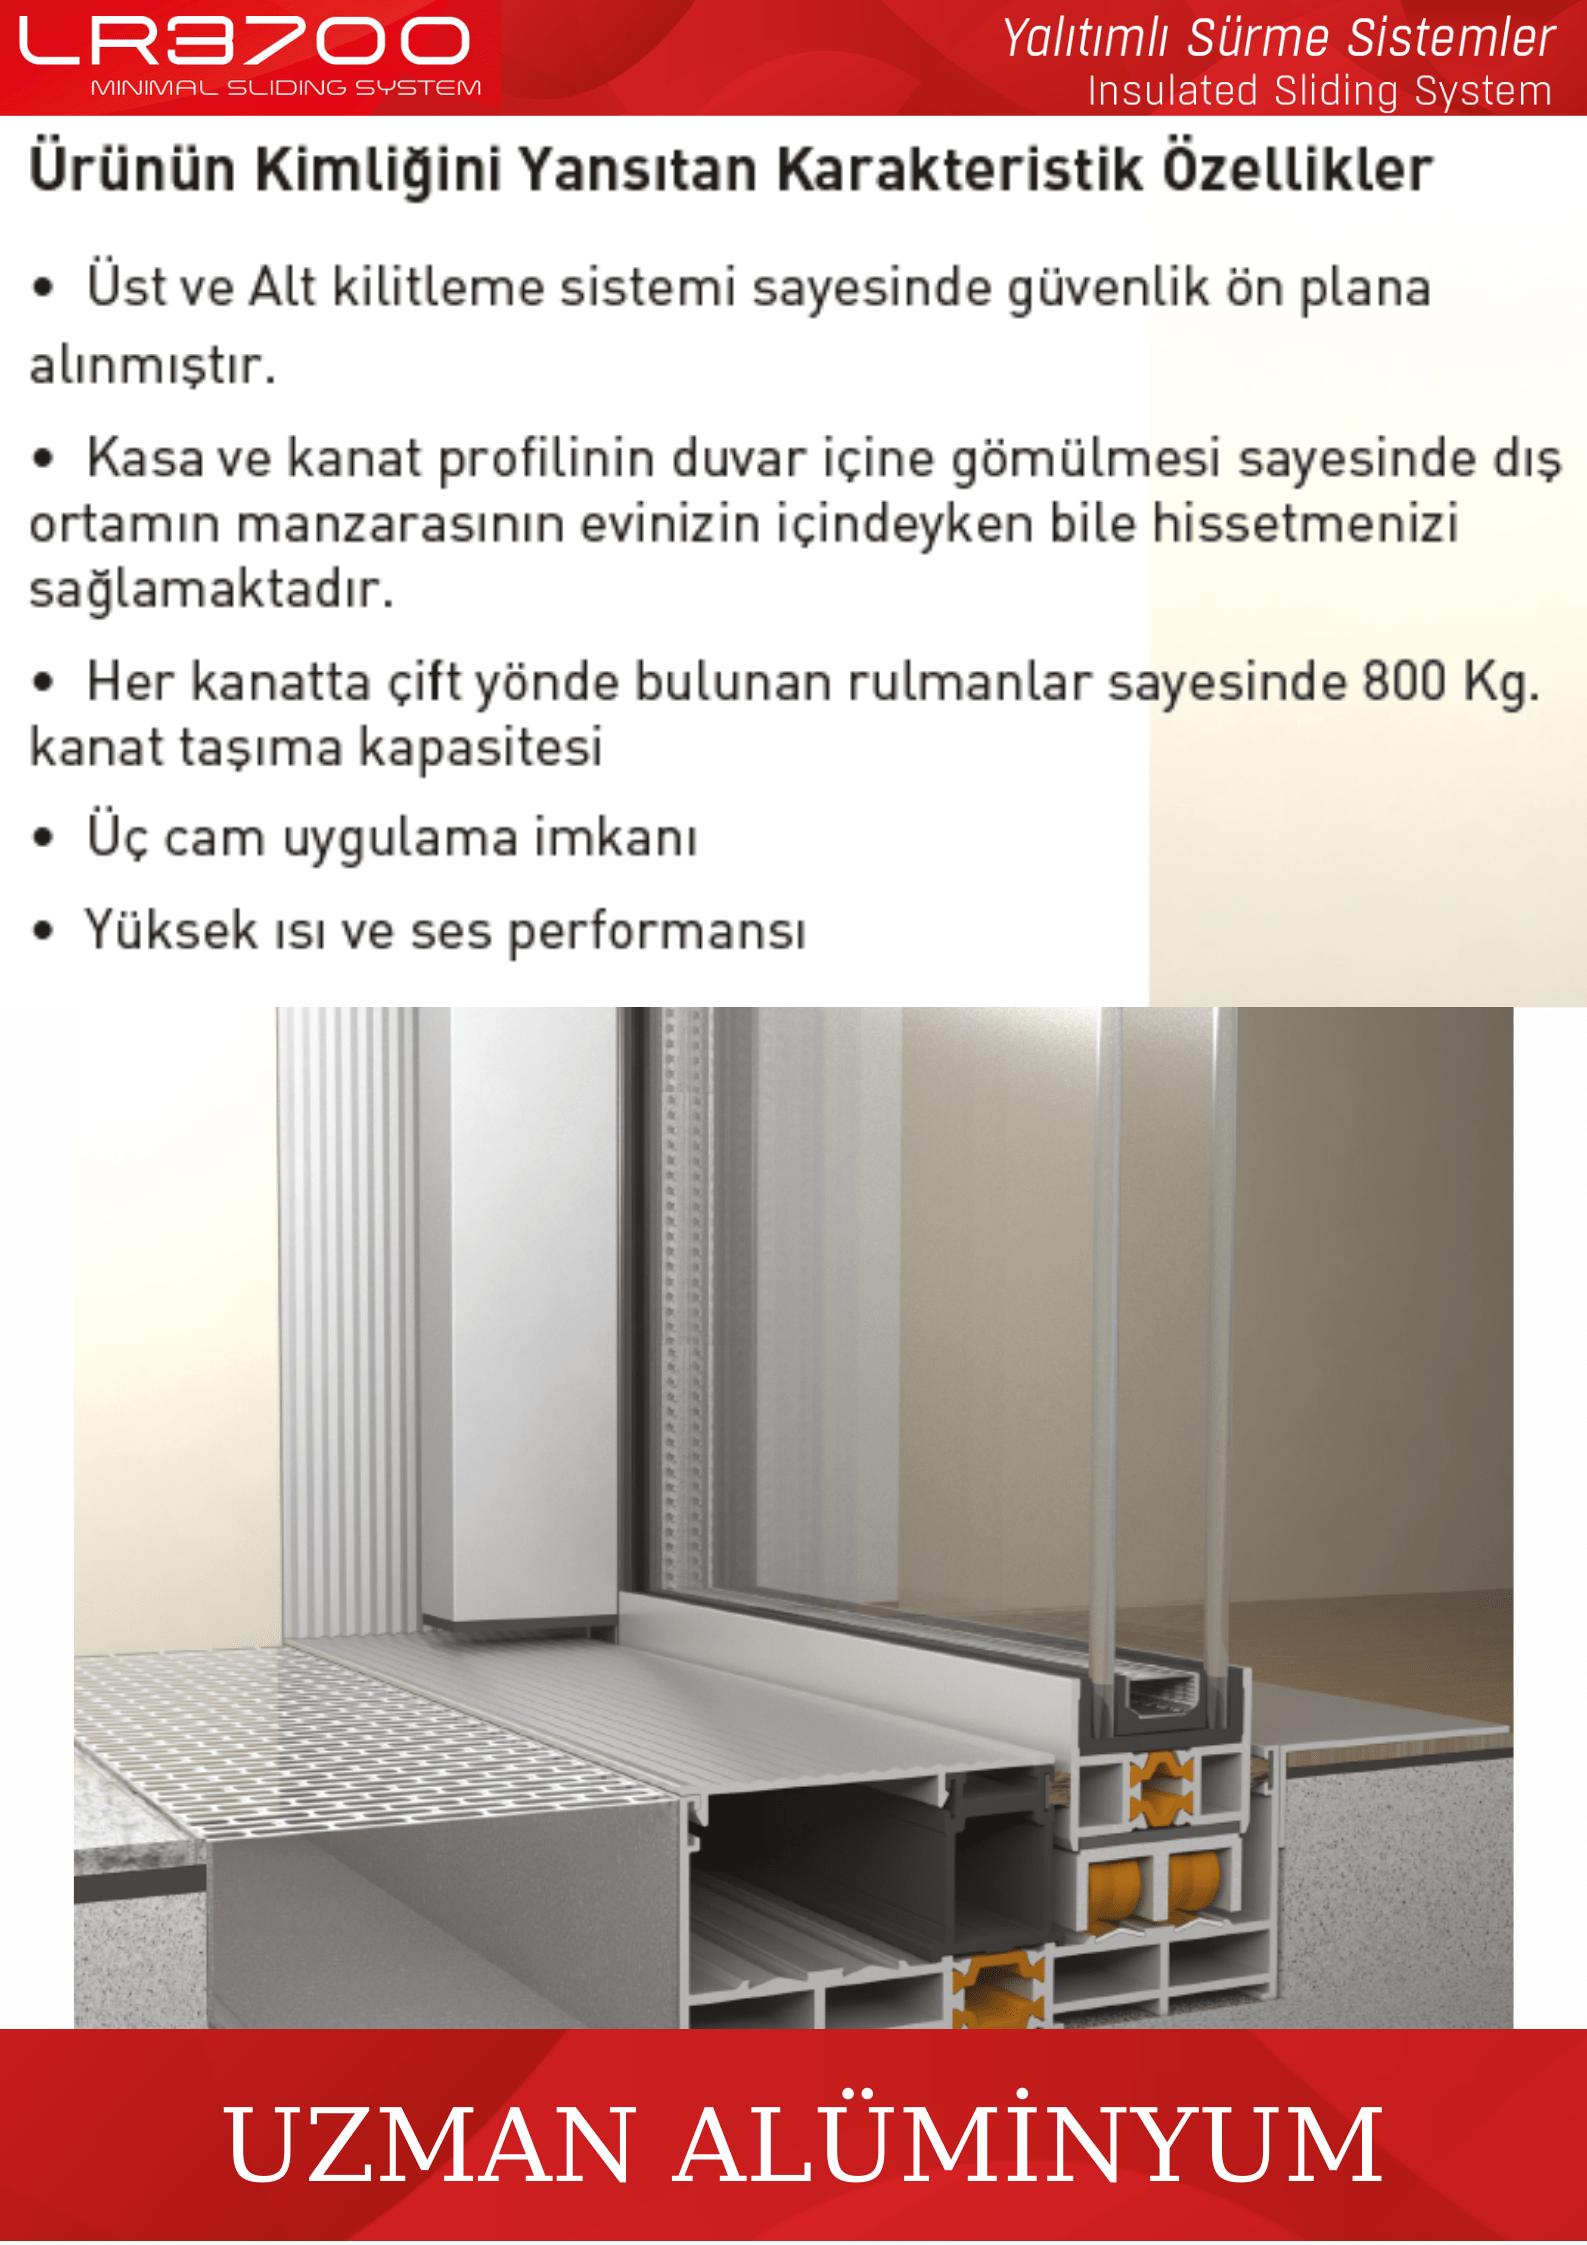 LR-3700 sürgü İzmir